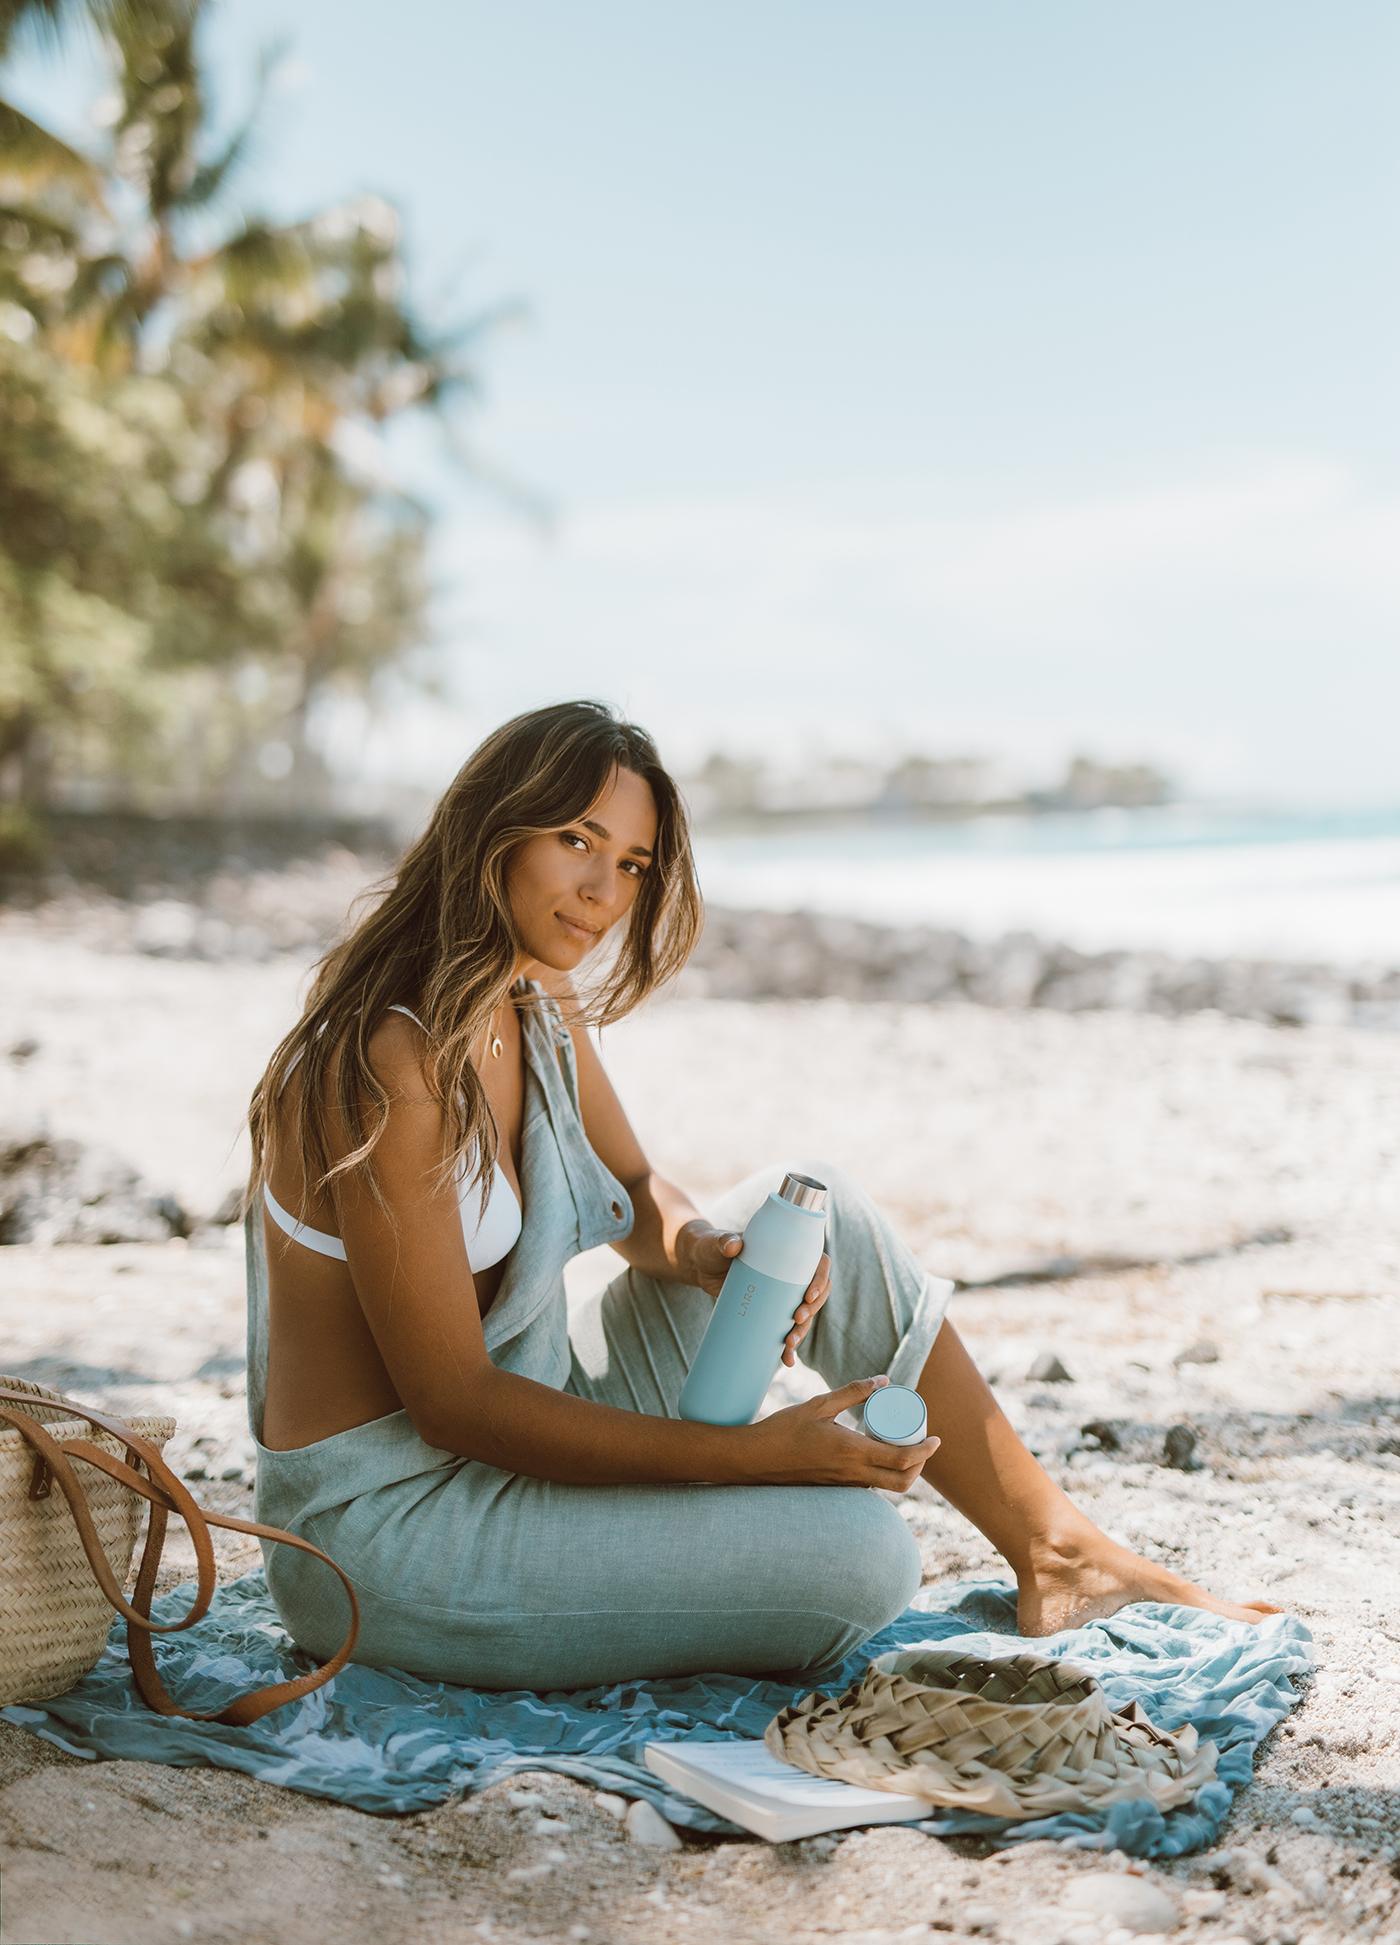 Elana Jadallah holding seaside mint LARQ Bottle on the beach in hawaii